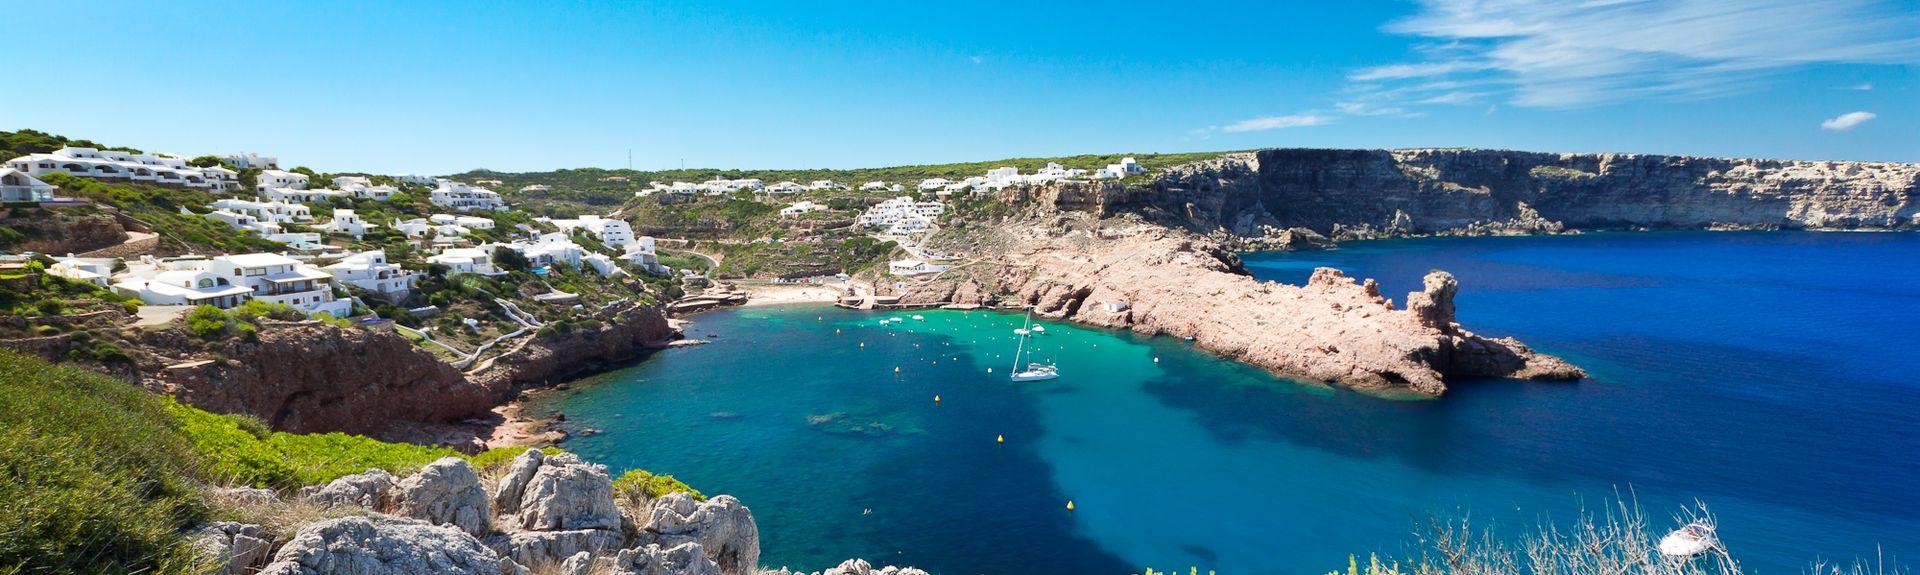 Son Carrió, Ciutadella de Menorca, Balearic Islands, Spain